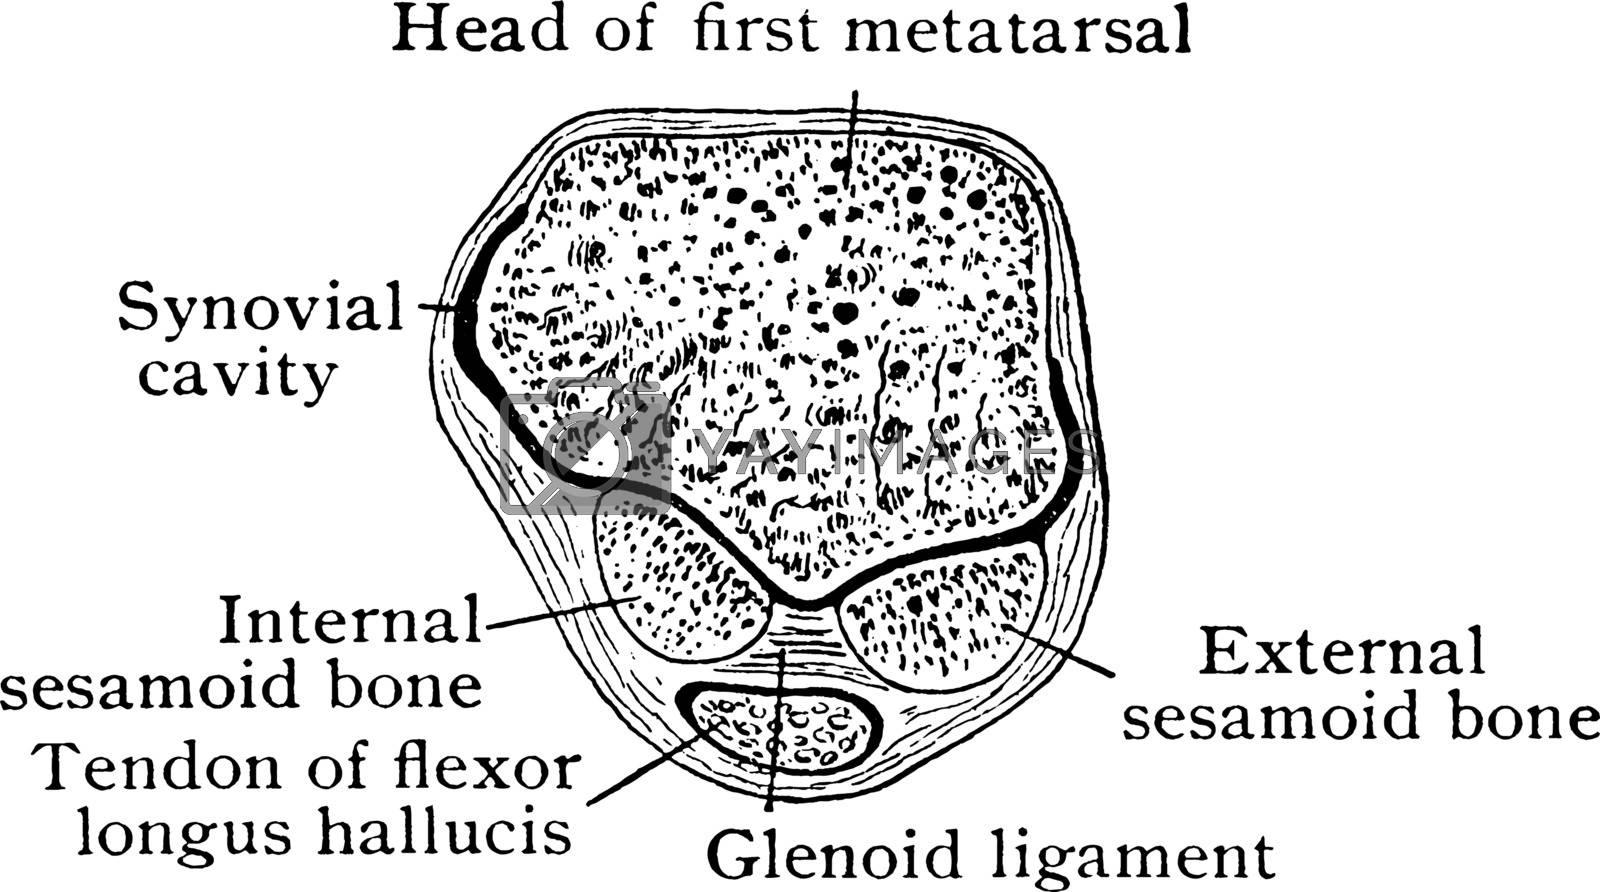 Transverse Section Through Metatarsal, vintage illustration. by Morphart